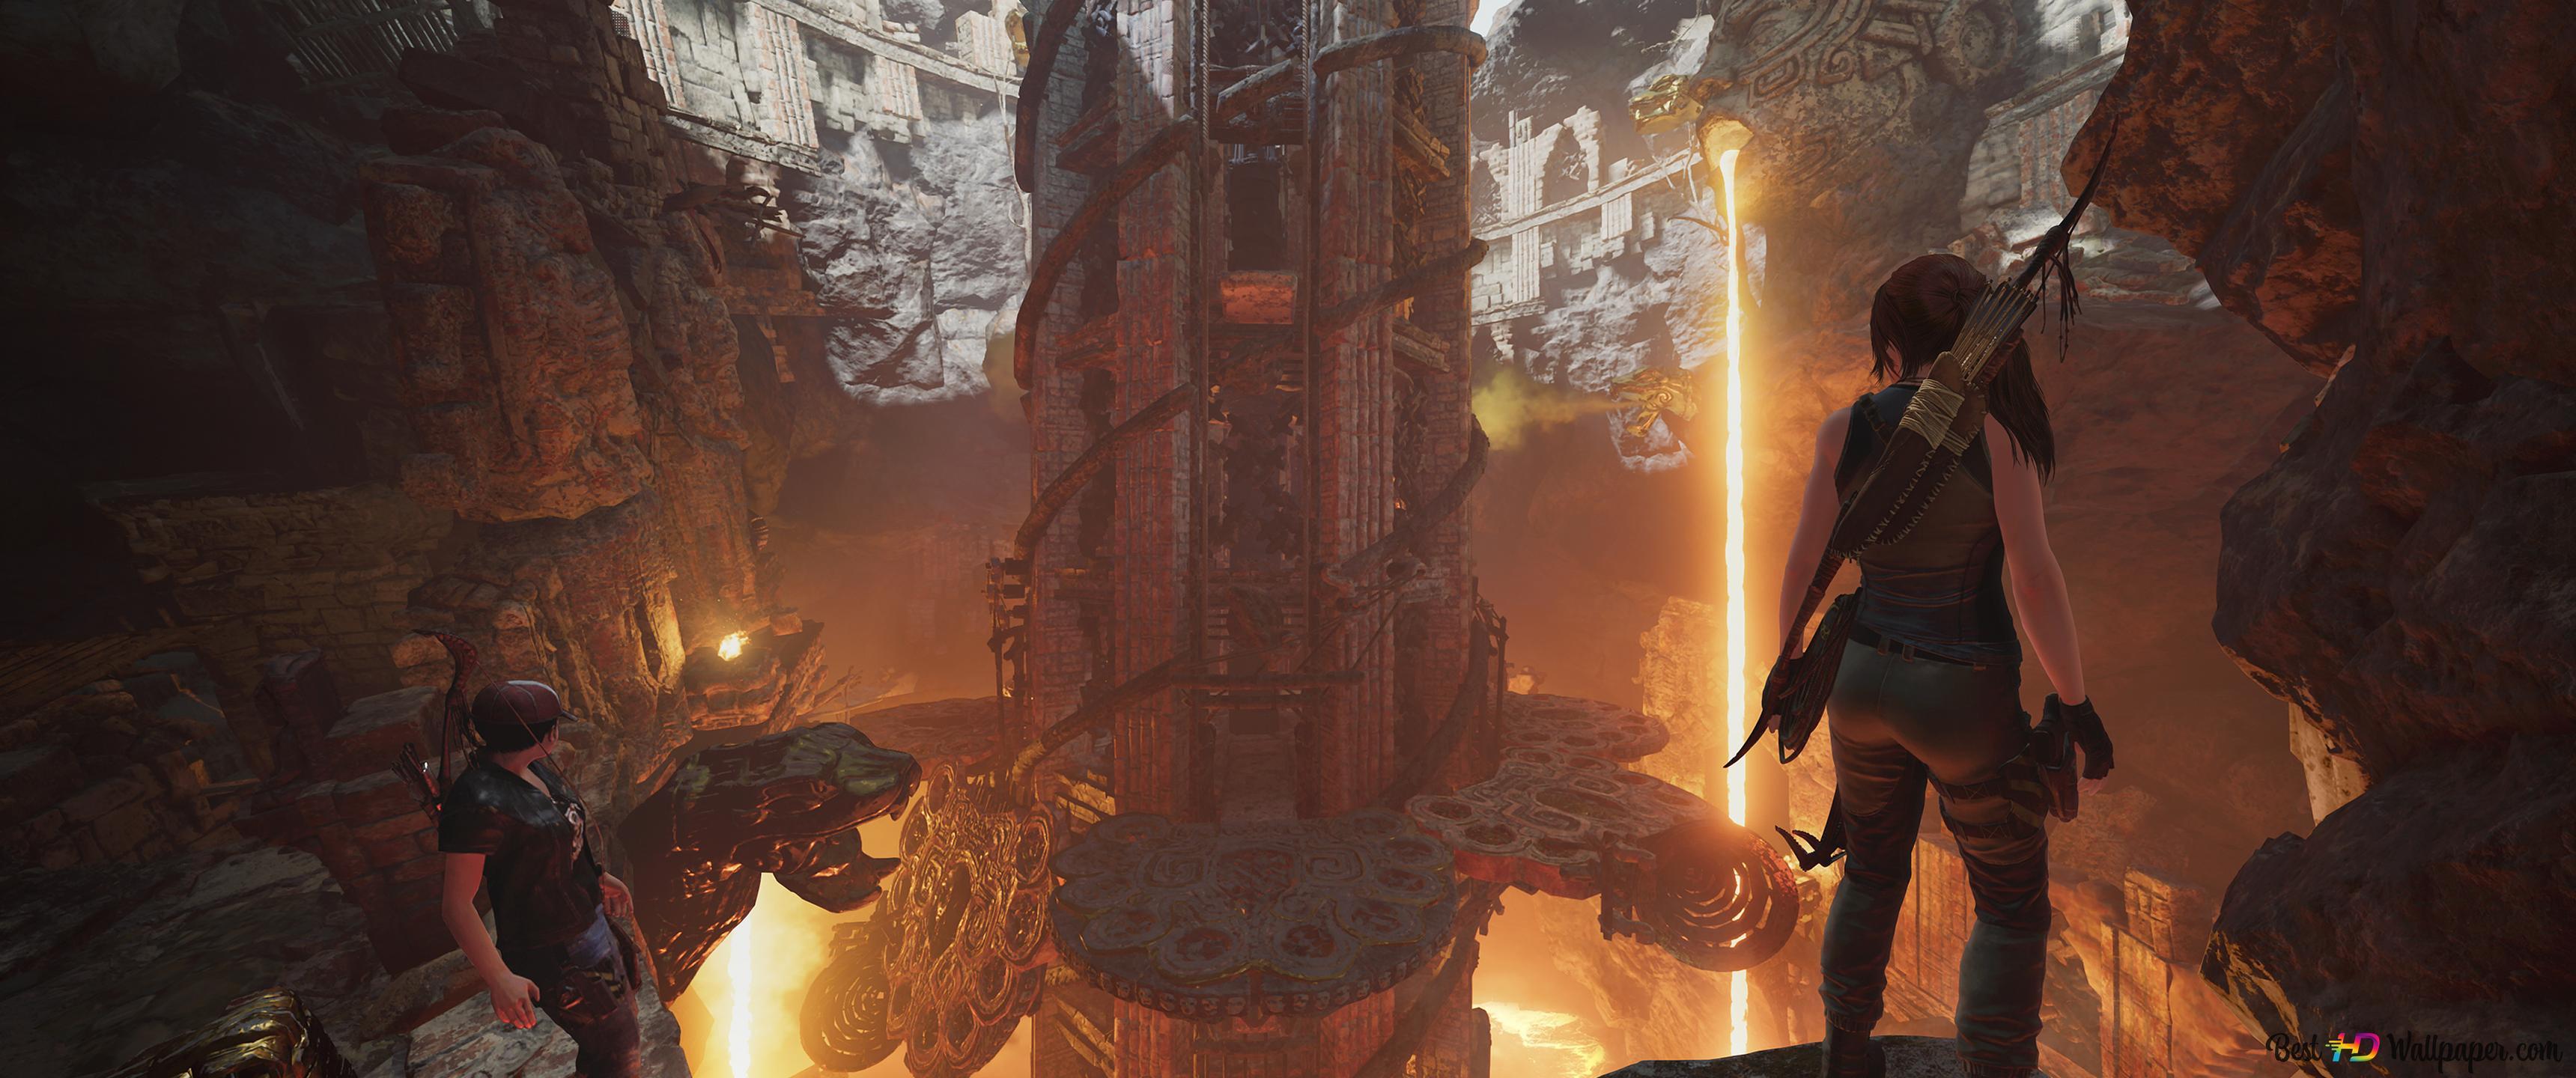 Shadow Of The Tomb Raider At The Ruins Hd Wallpaper Download